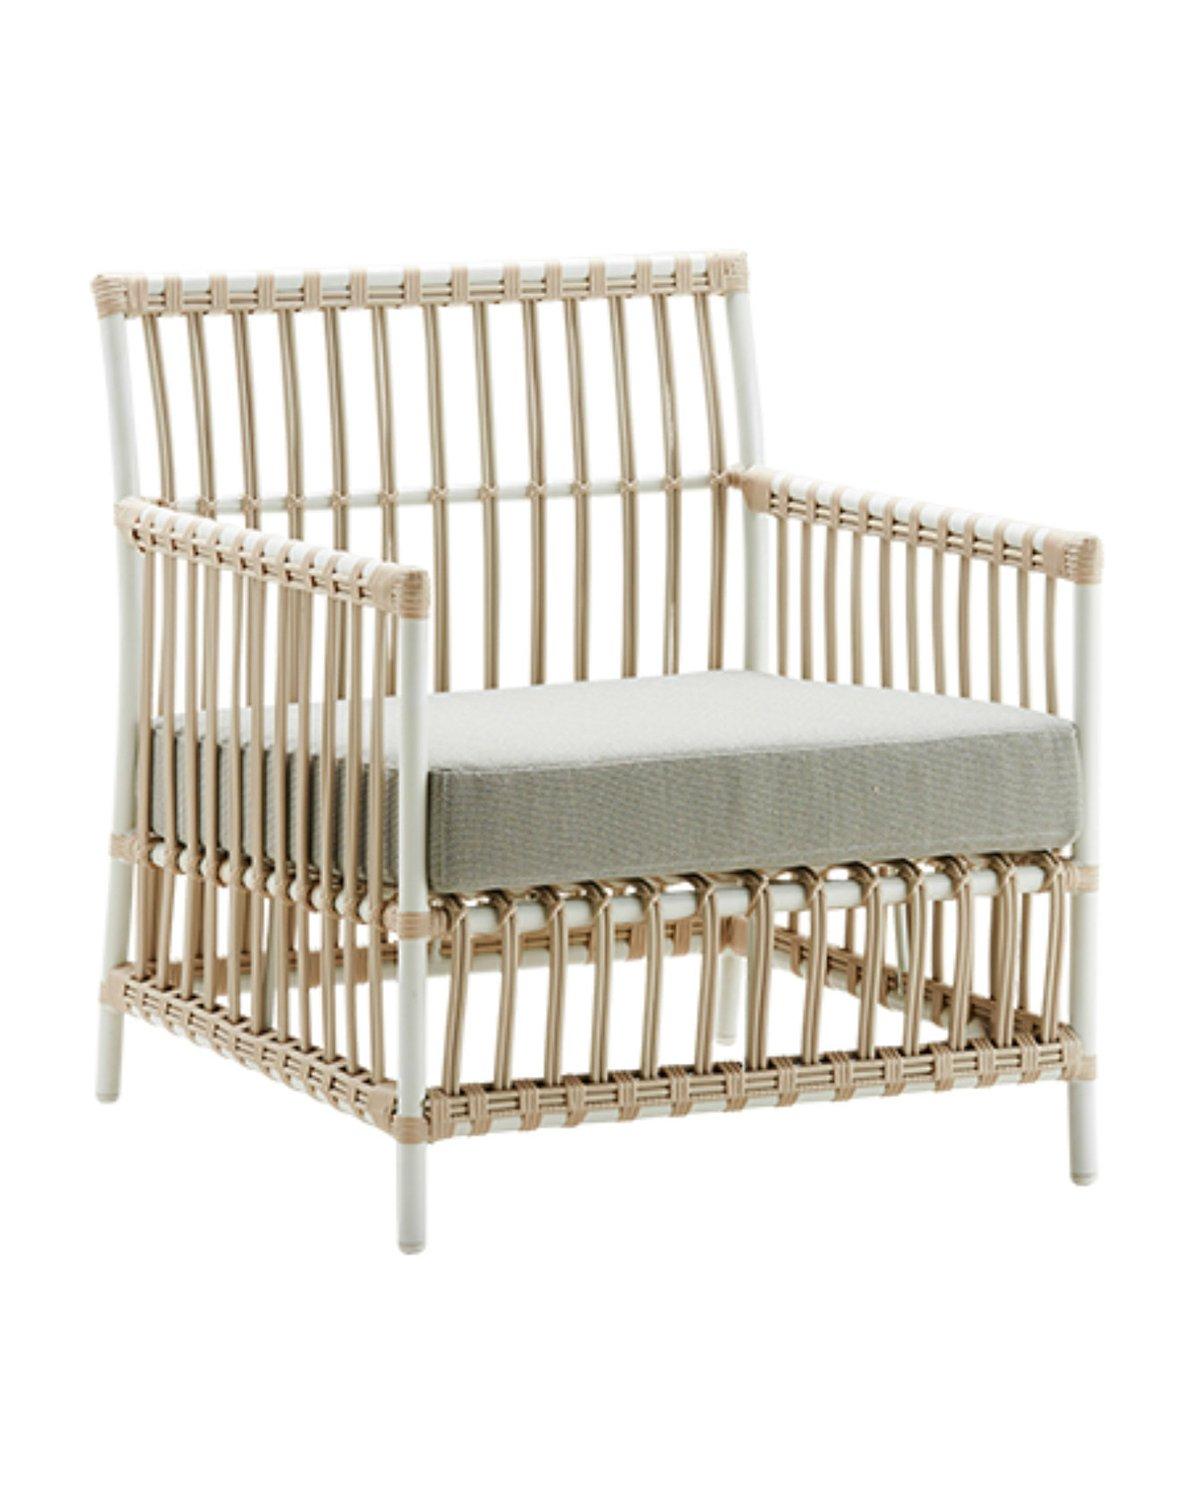 Riboldi_Lounge_Chair.jpg